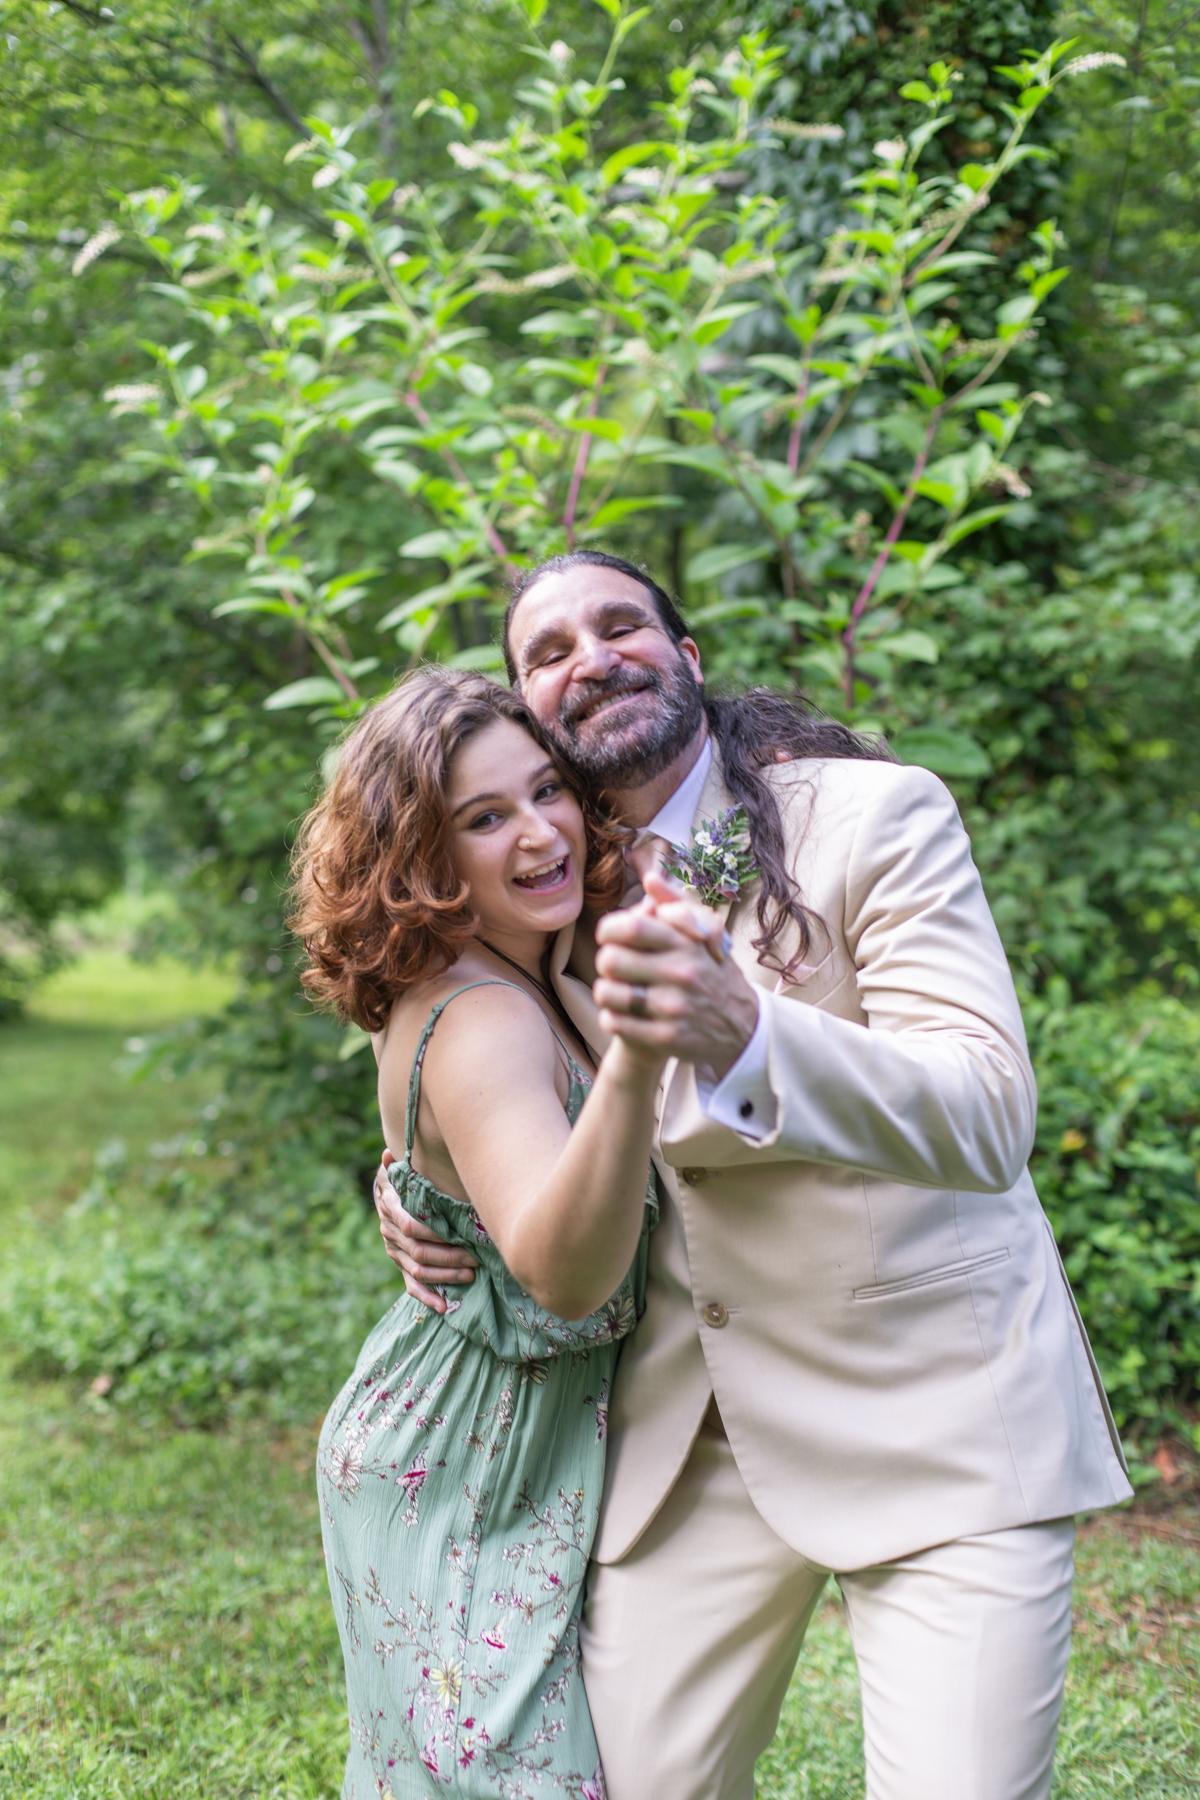 Avyanna and Phoenix Wedding 2019_photos by Studio Misha_BLOG-107.jpg